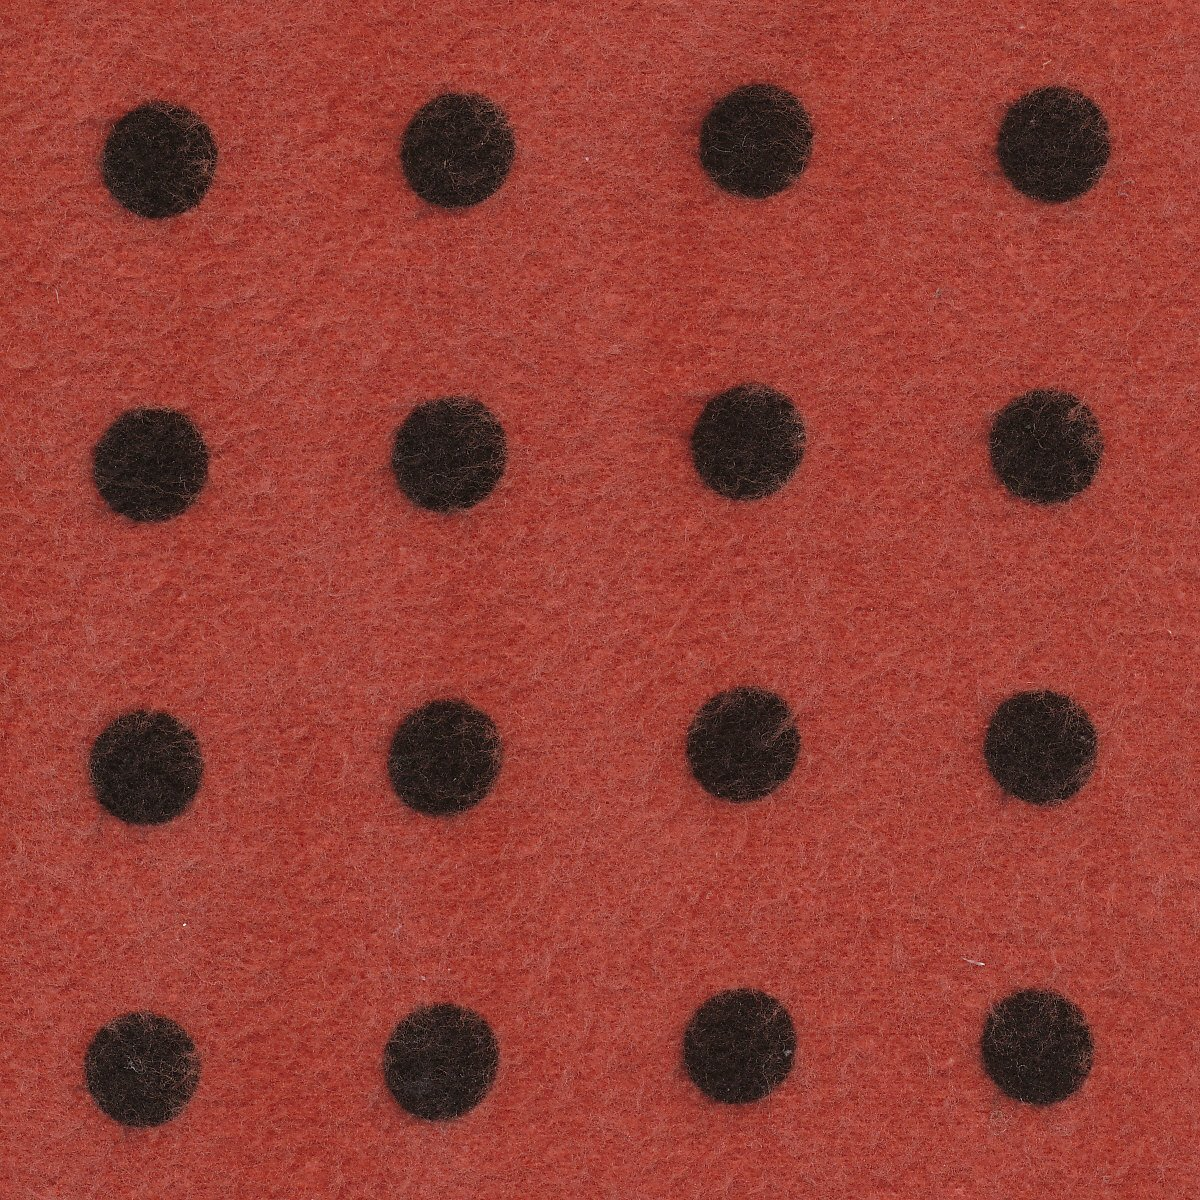 Woolies Flannel - MASF18145-R